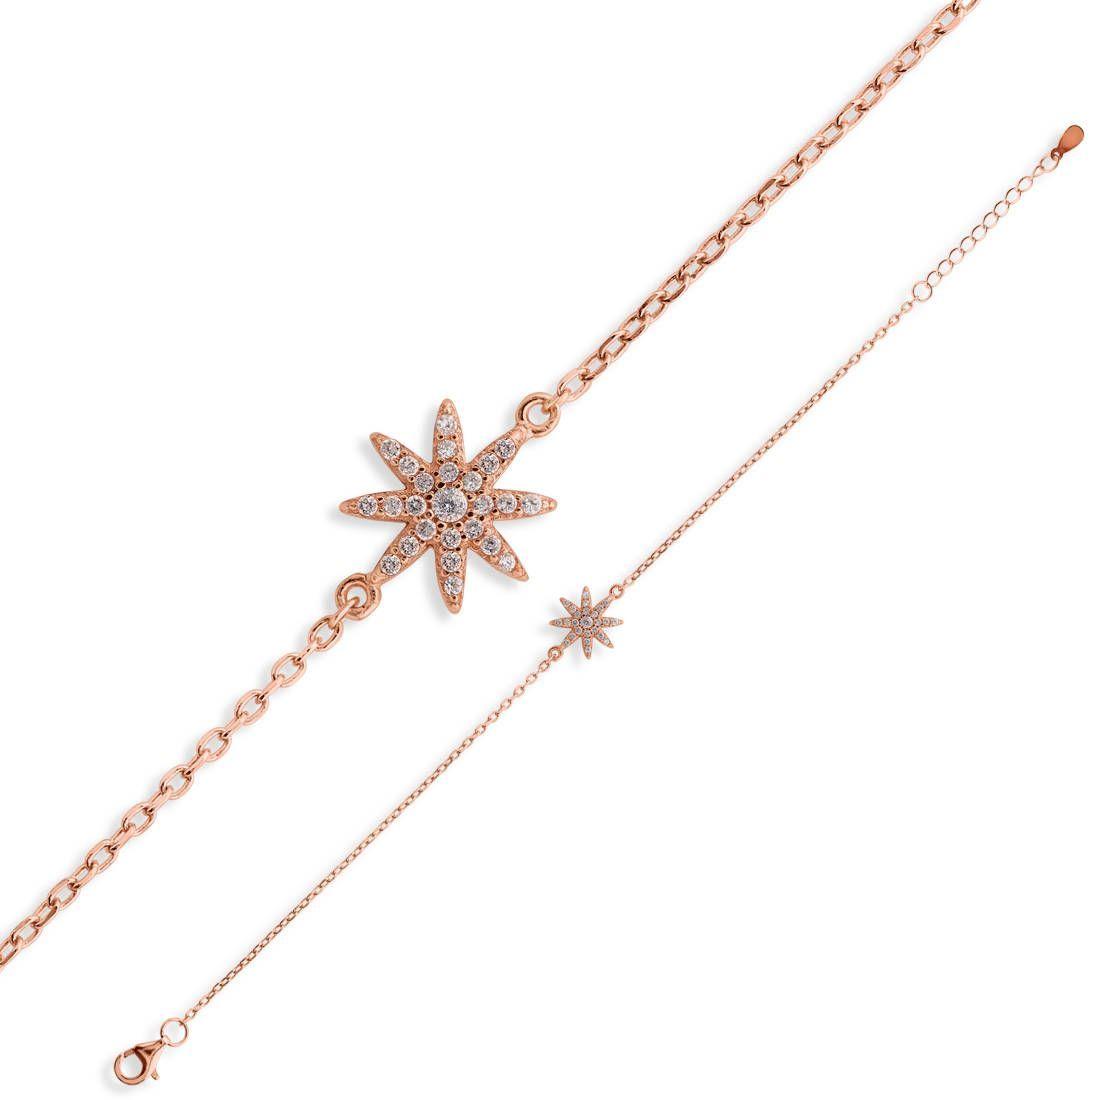 Star bracelet sterling silver bracelet ladies bracelet k